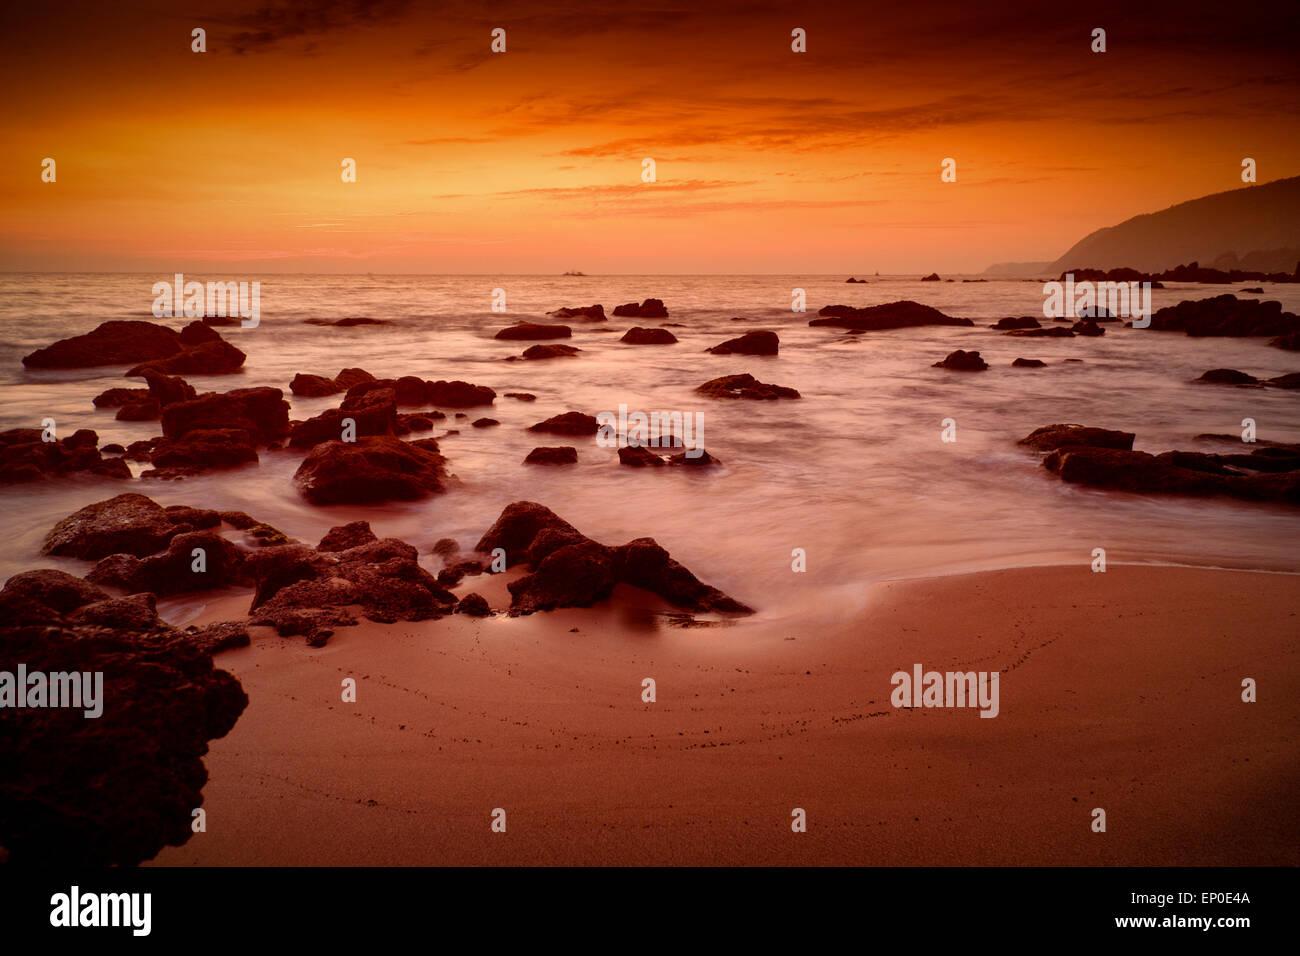 Sunset posluminiscencia en cola Playa, Canacona,Goa, India Imagen De Stock